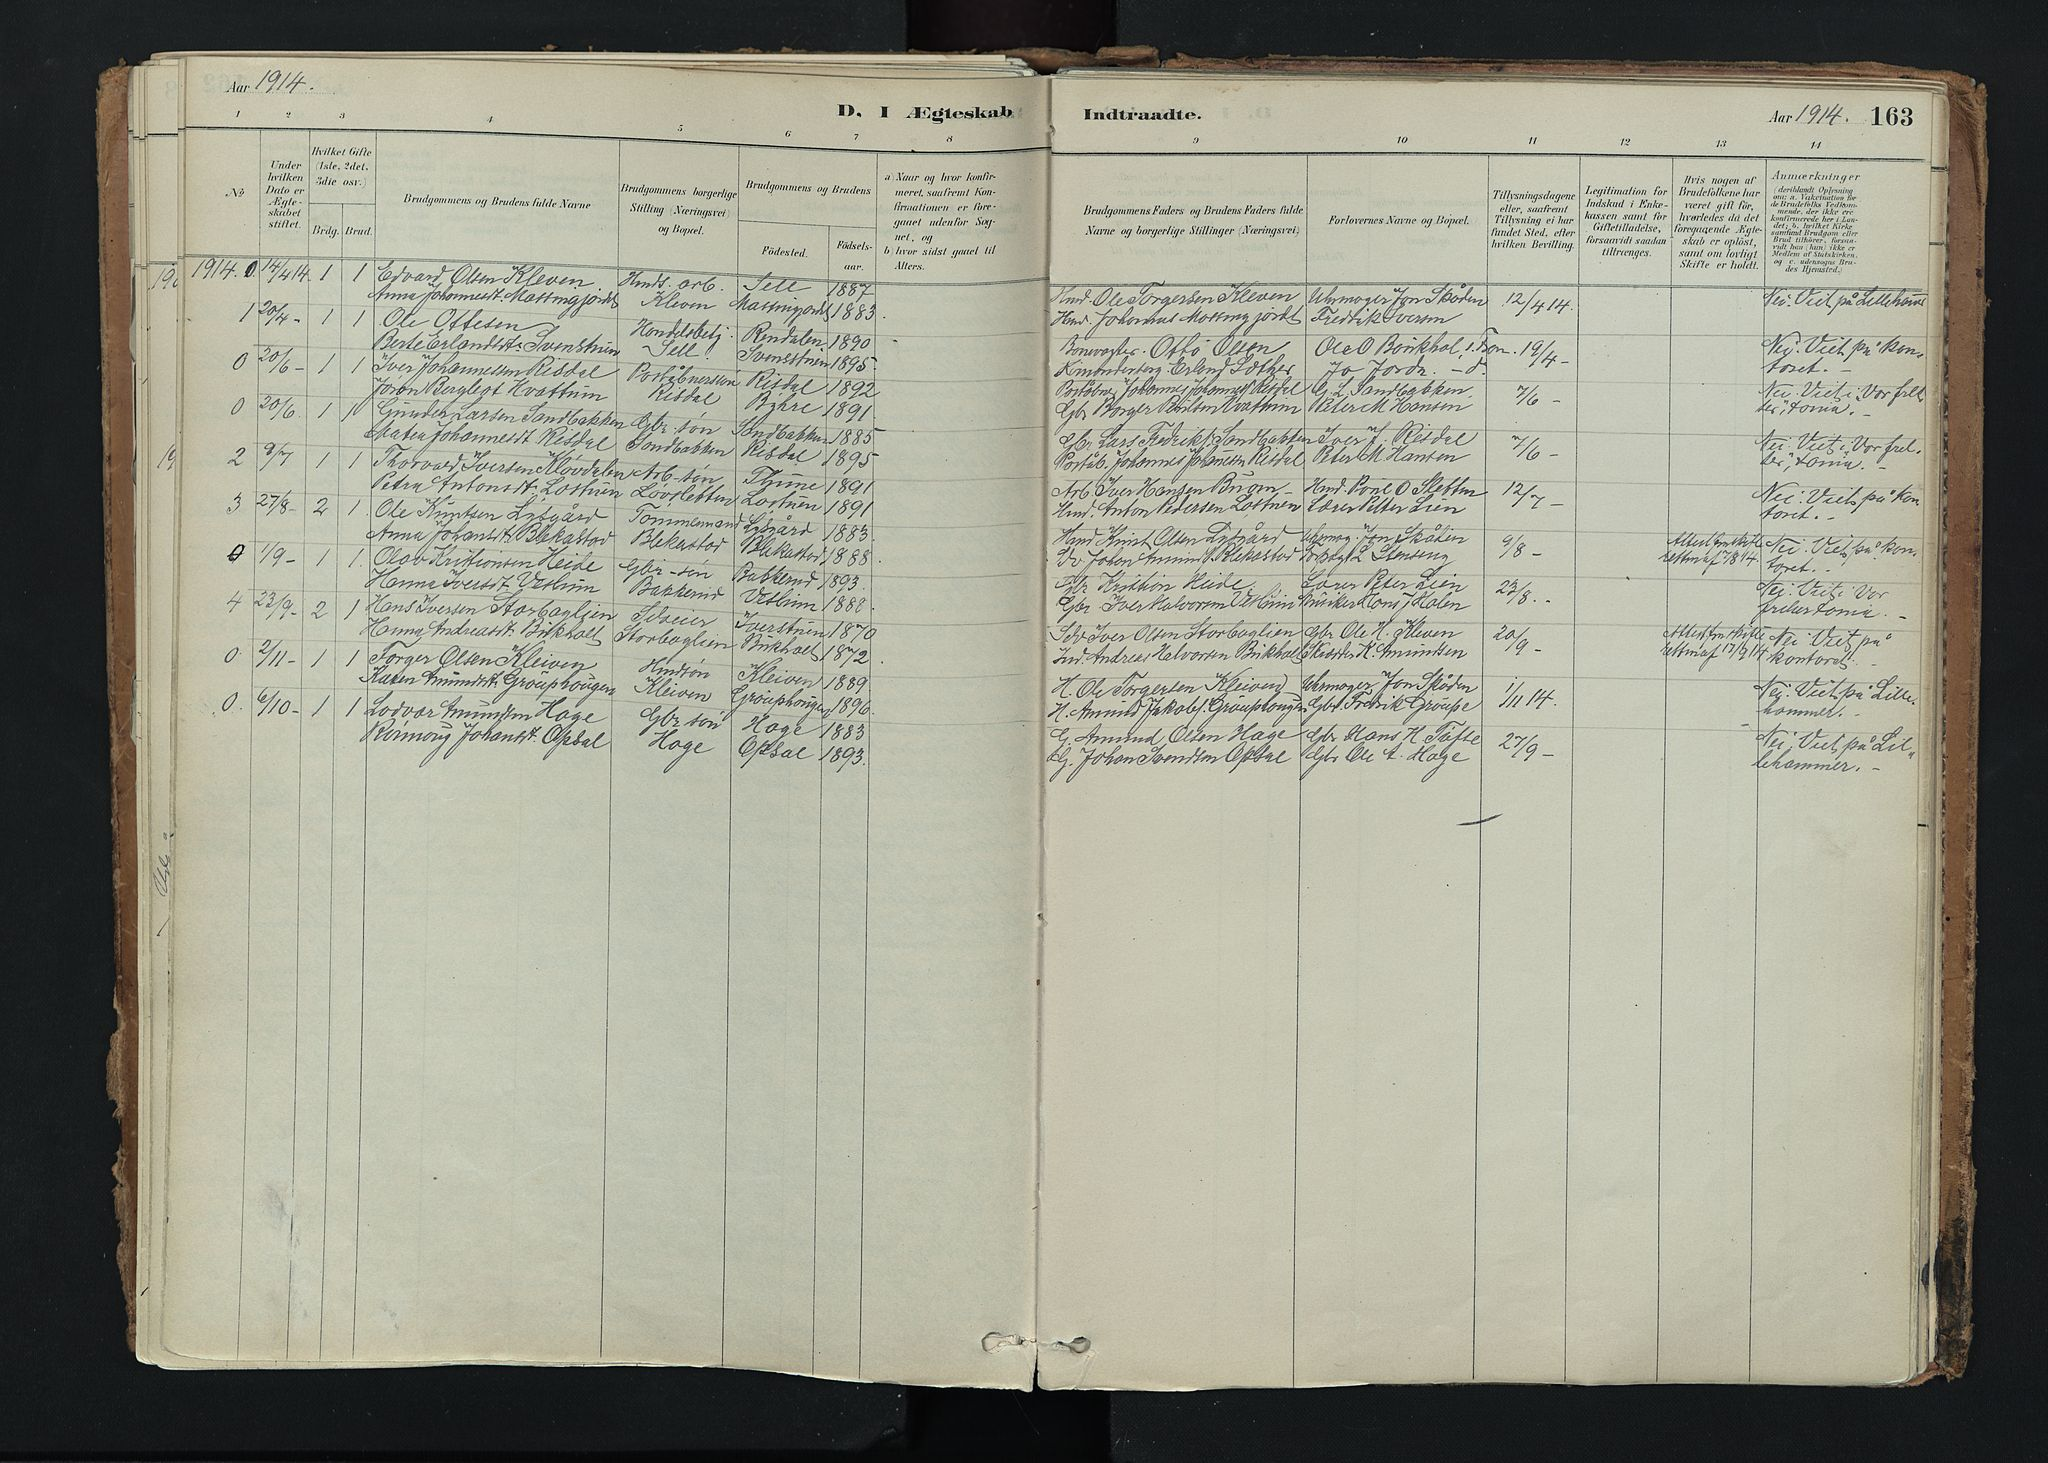 SAH, Nord-Fron prestekontor, Ministerialbok nr. 5, 1884-1914, s. 163